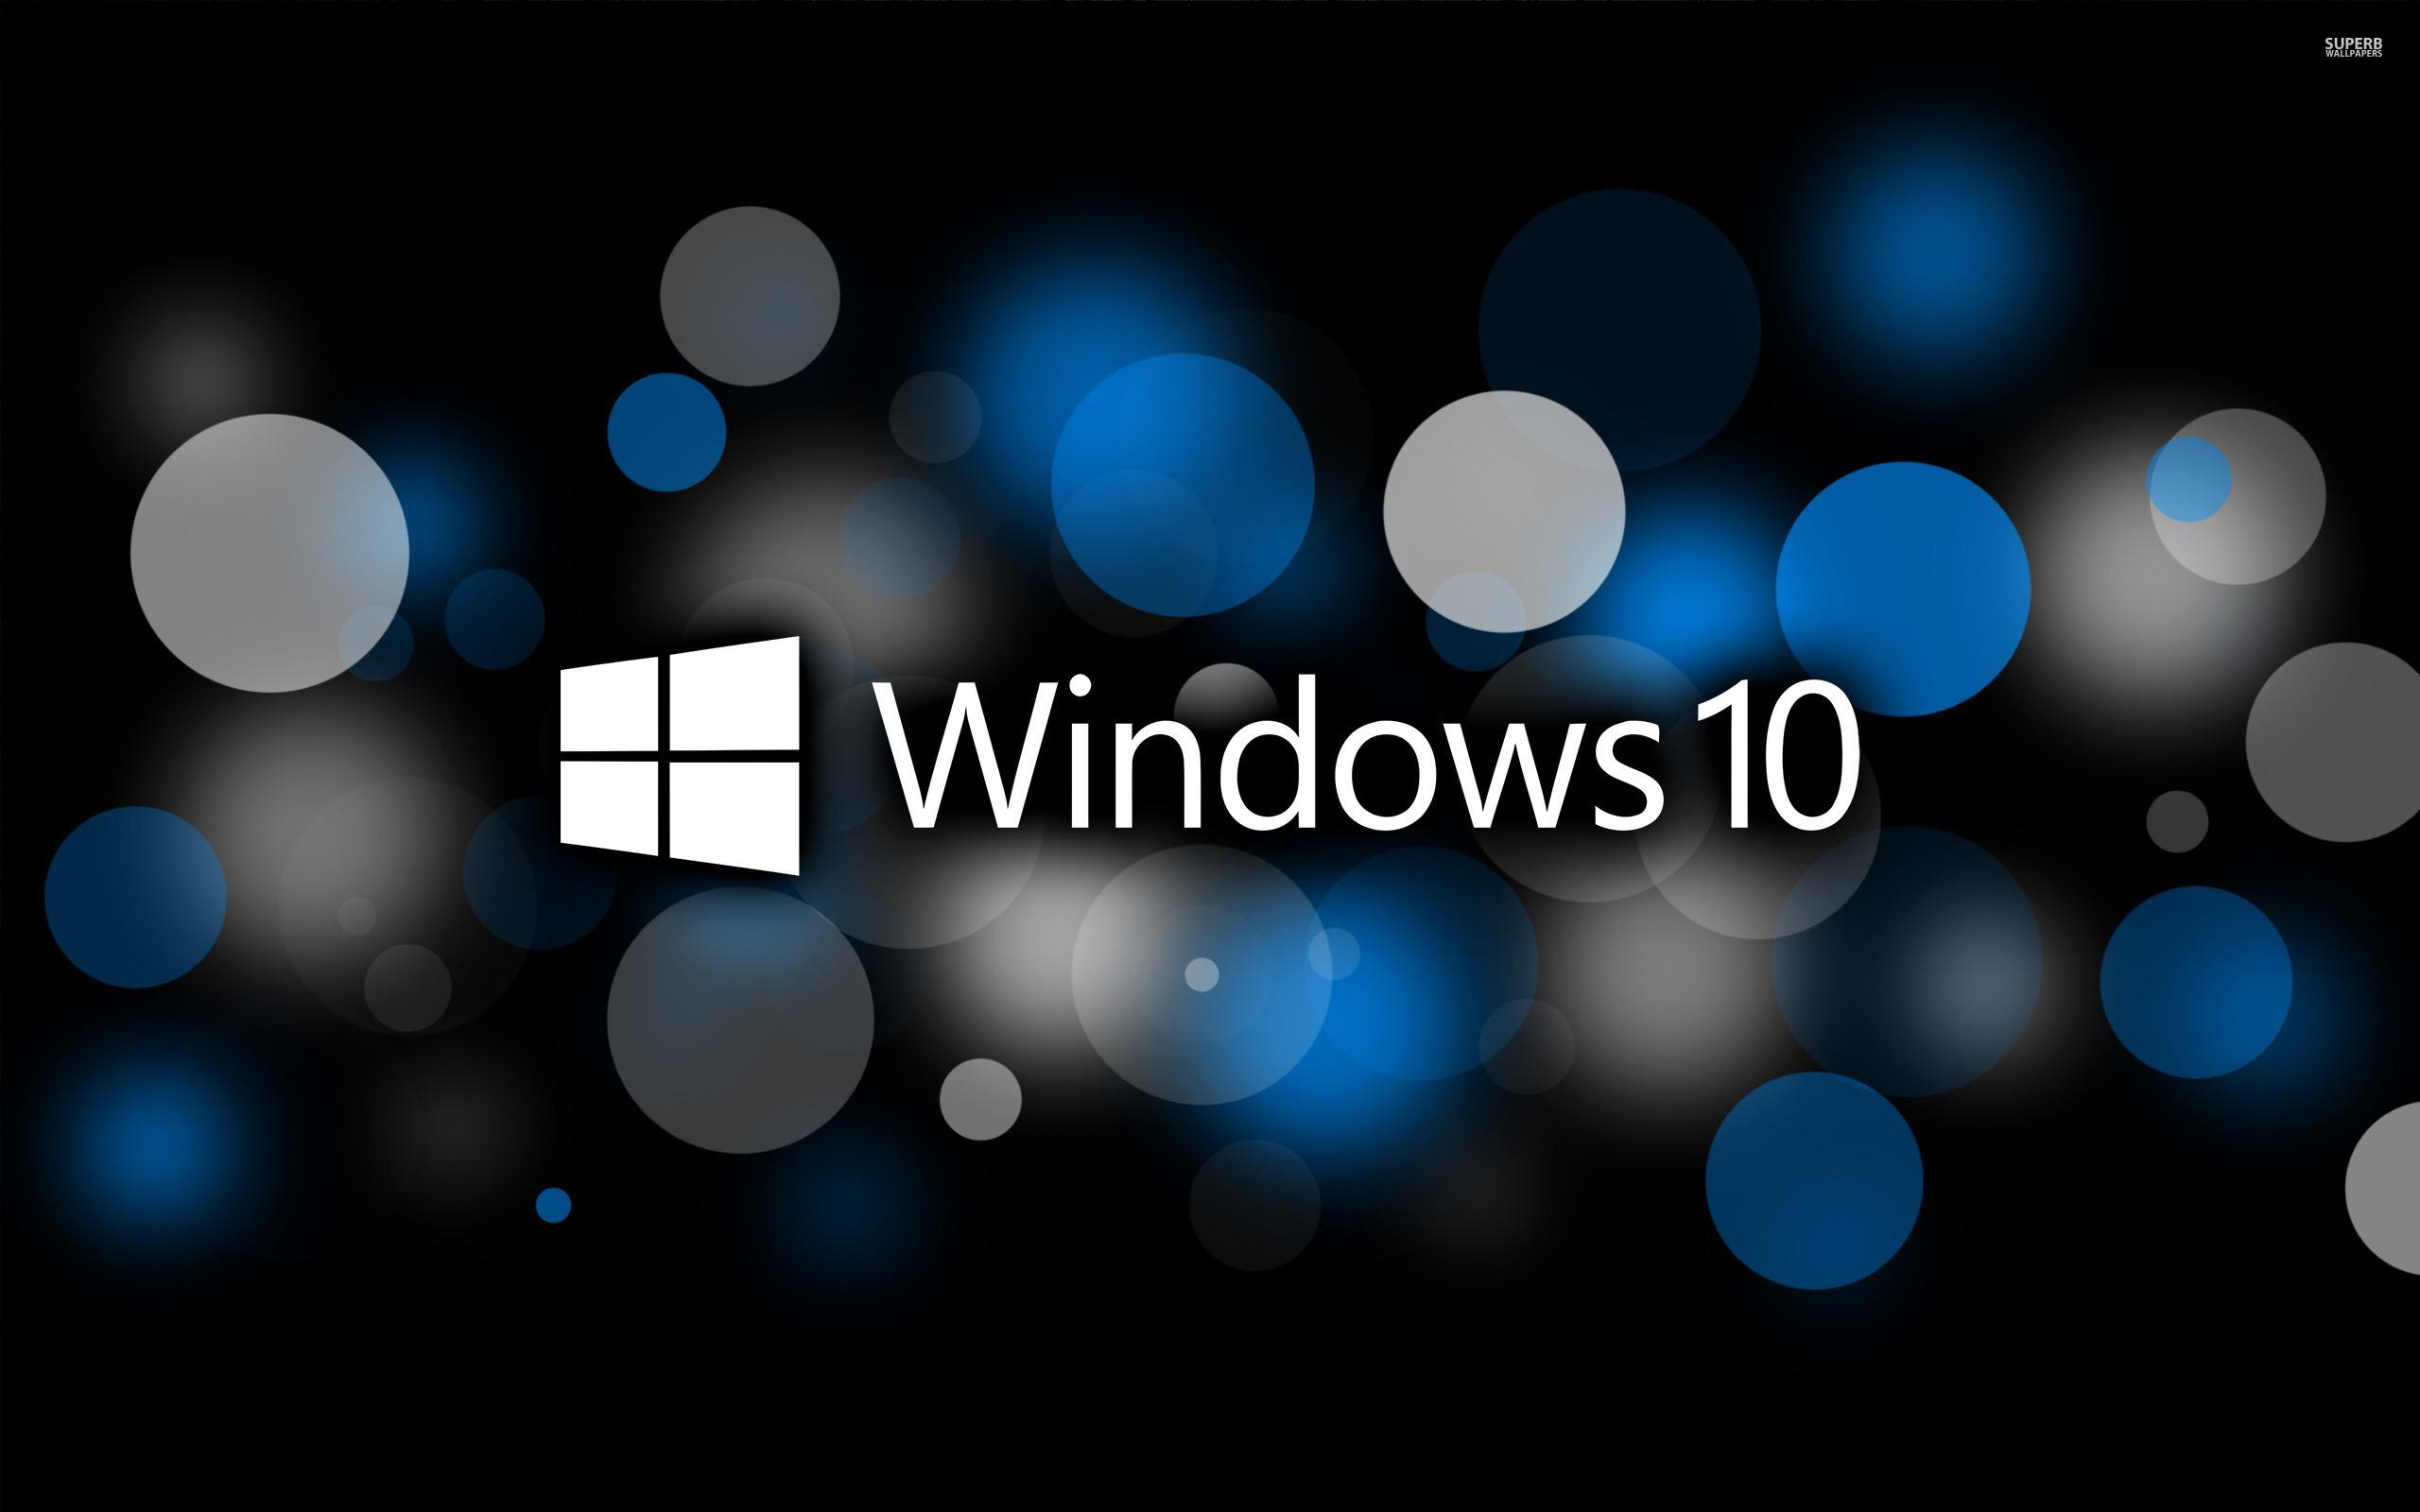 Free HD Windows 10 Wallpapers - WallpaperSafari